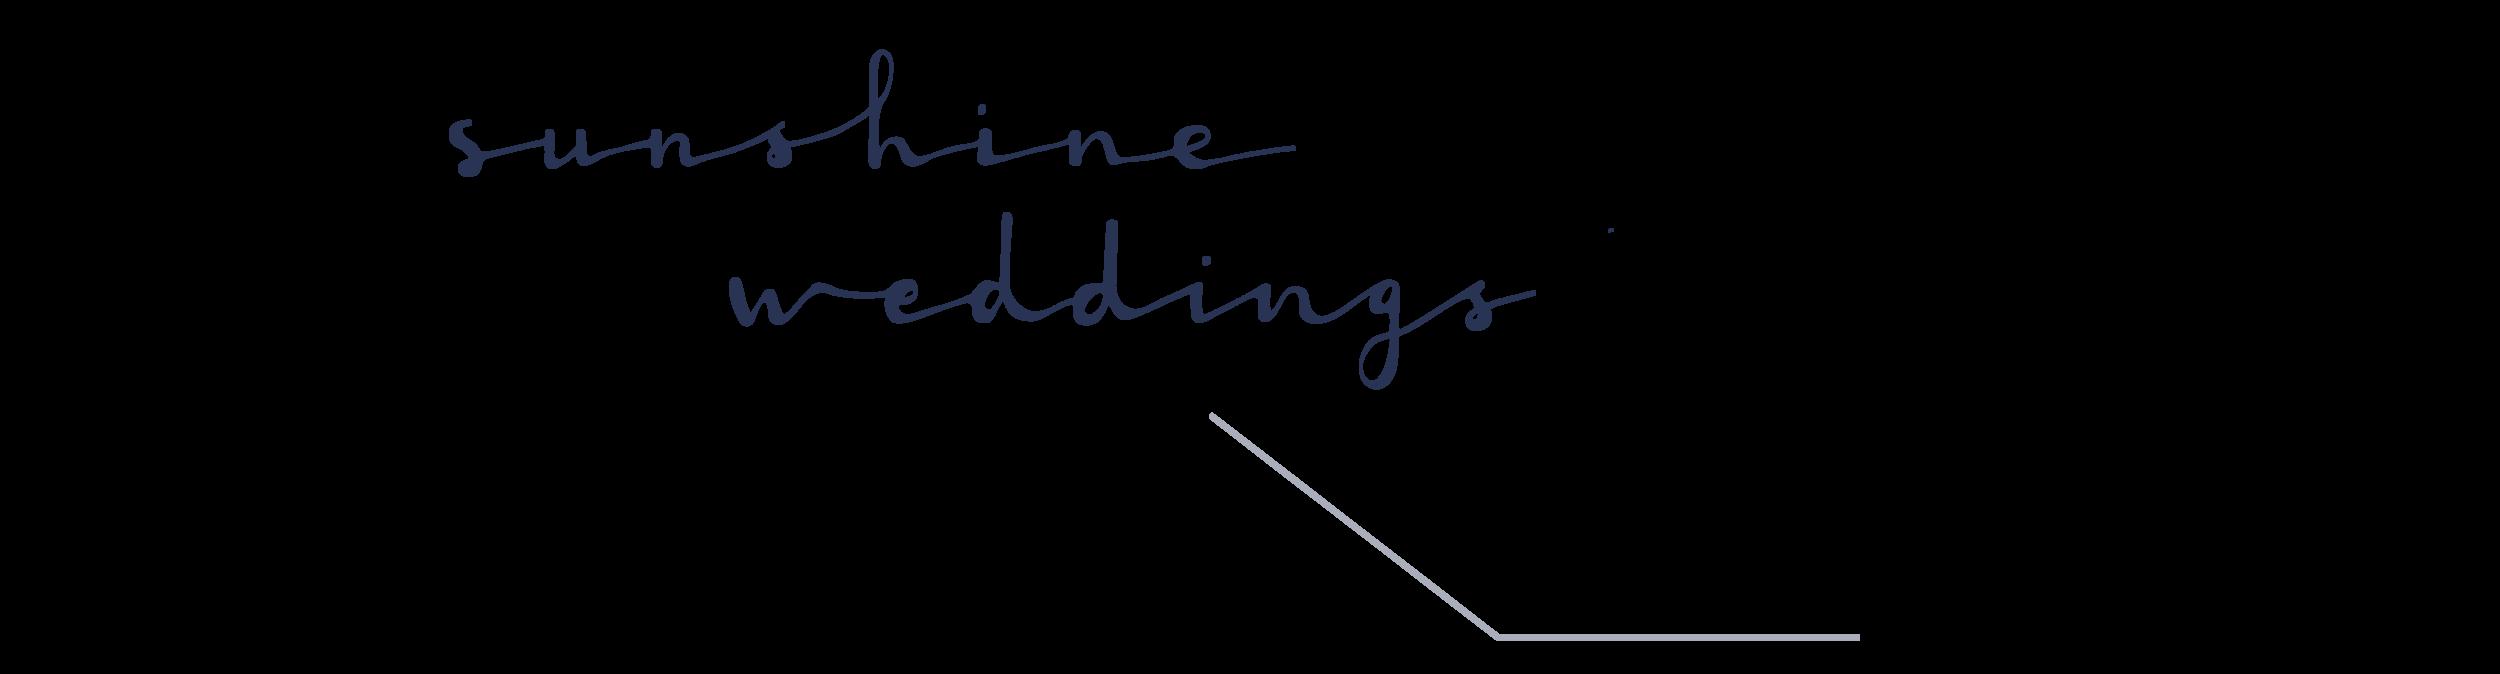 Sunshine Weddings Spain